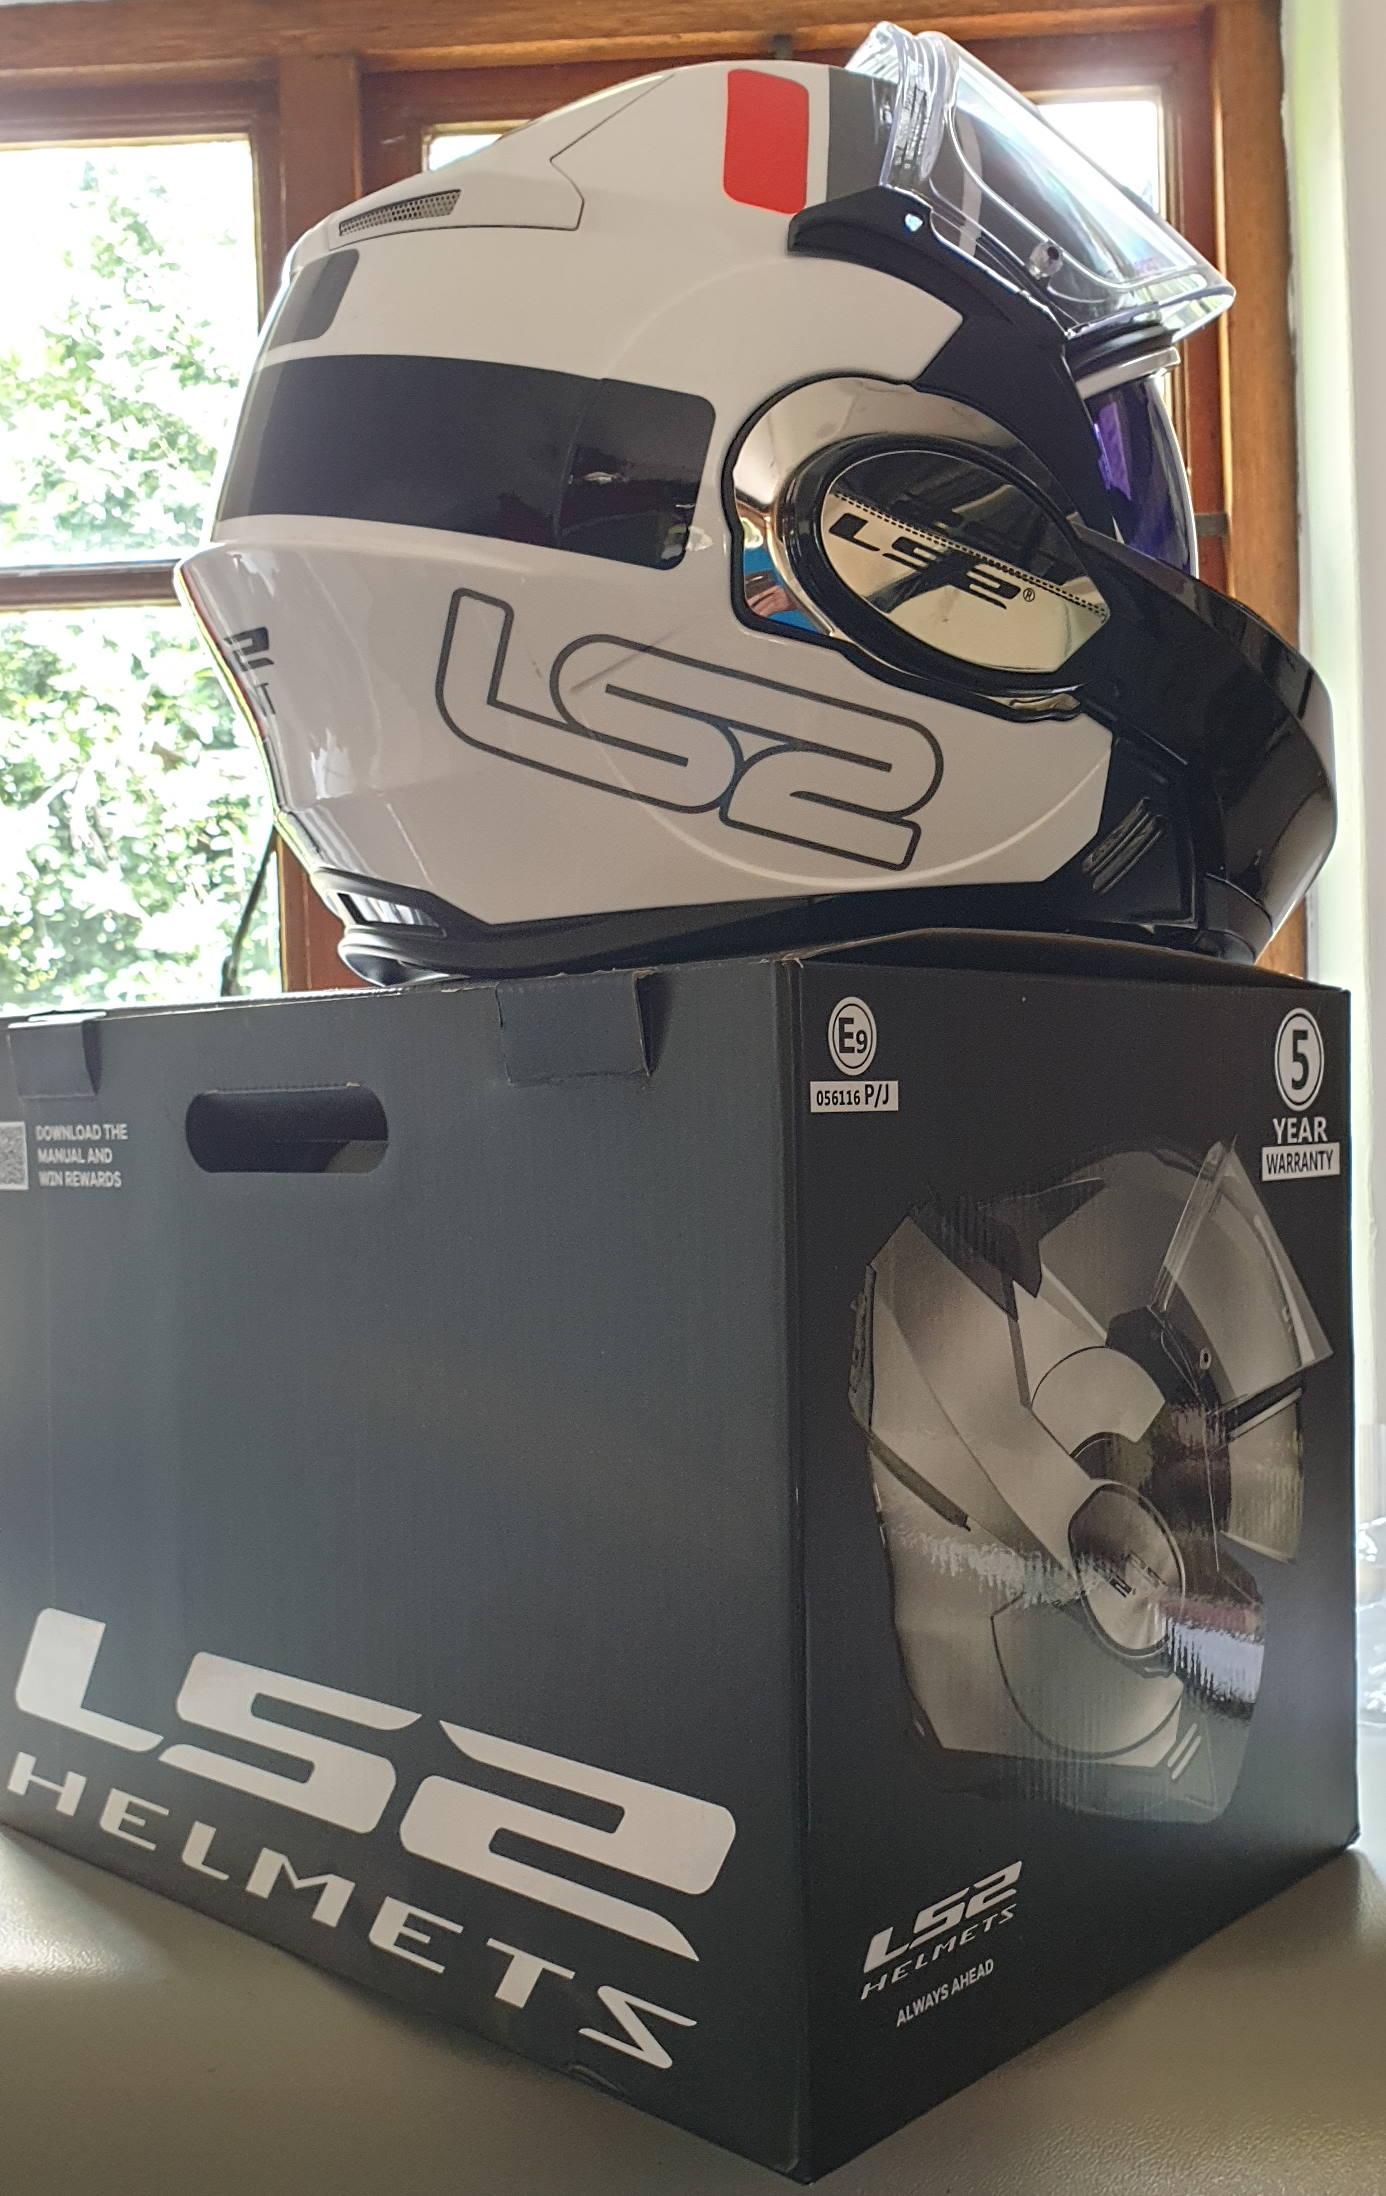 Motor cycle gear: Jacket, Helmet, Boots, Gloves